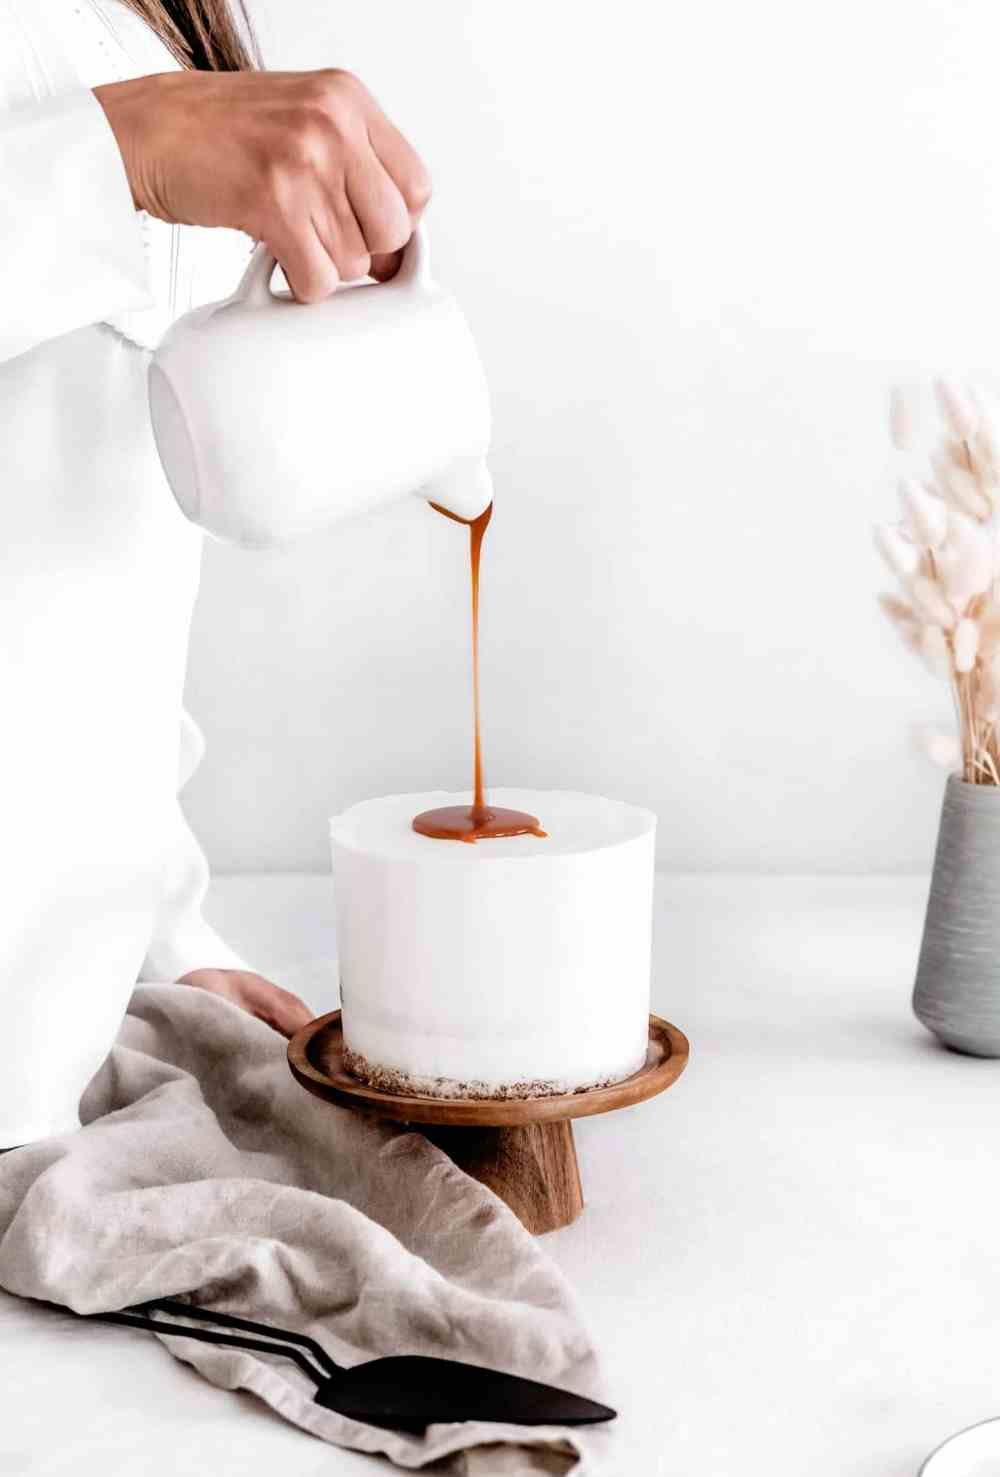 Layer cake vanille et caramel au beurre salé